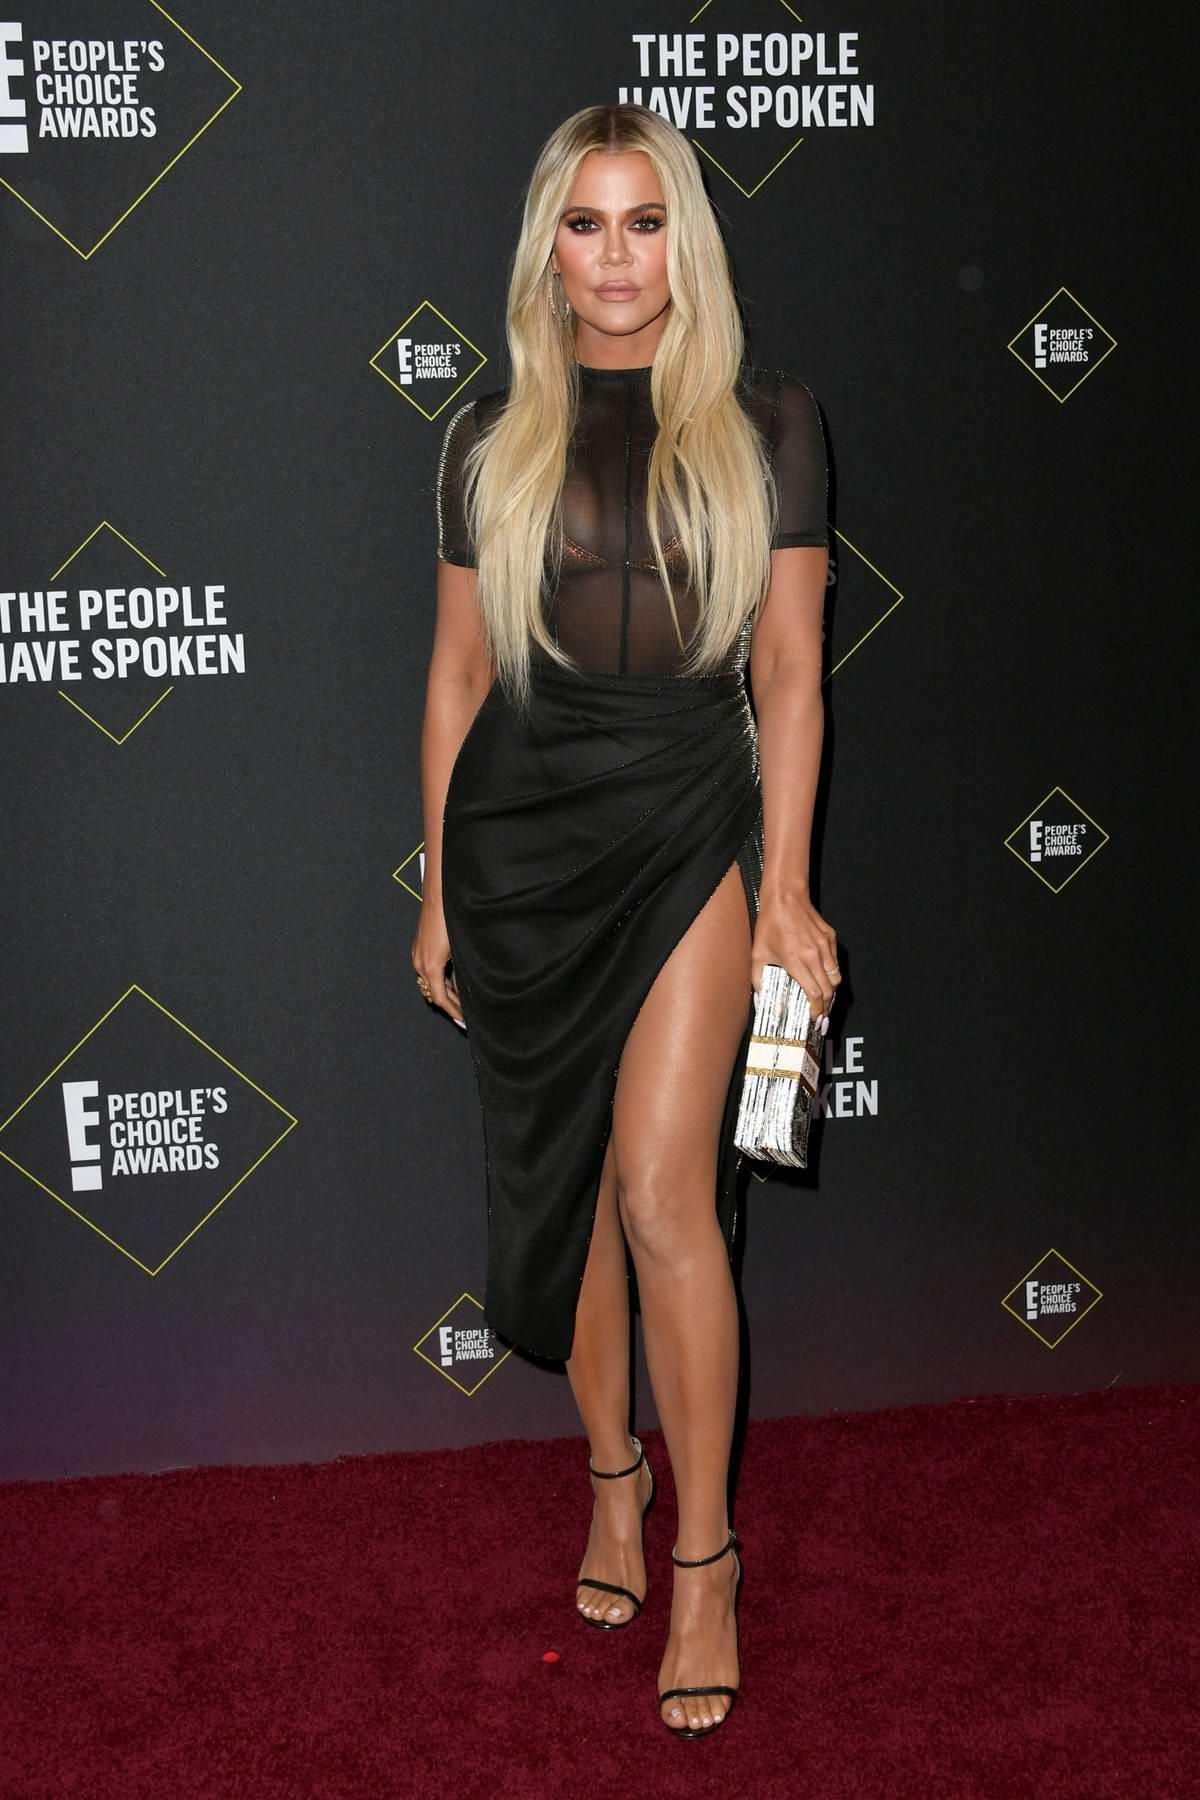 Khloe Kardashian attends the 2019 E! People's Choice Awards held at the Barker Hangar in Santa Monica, California